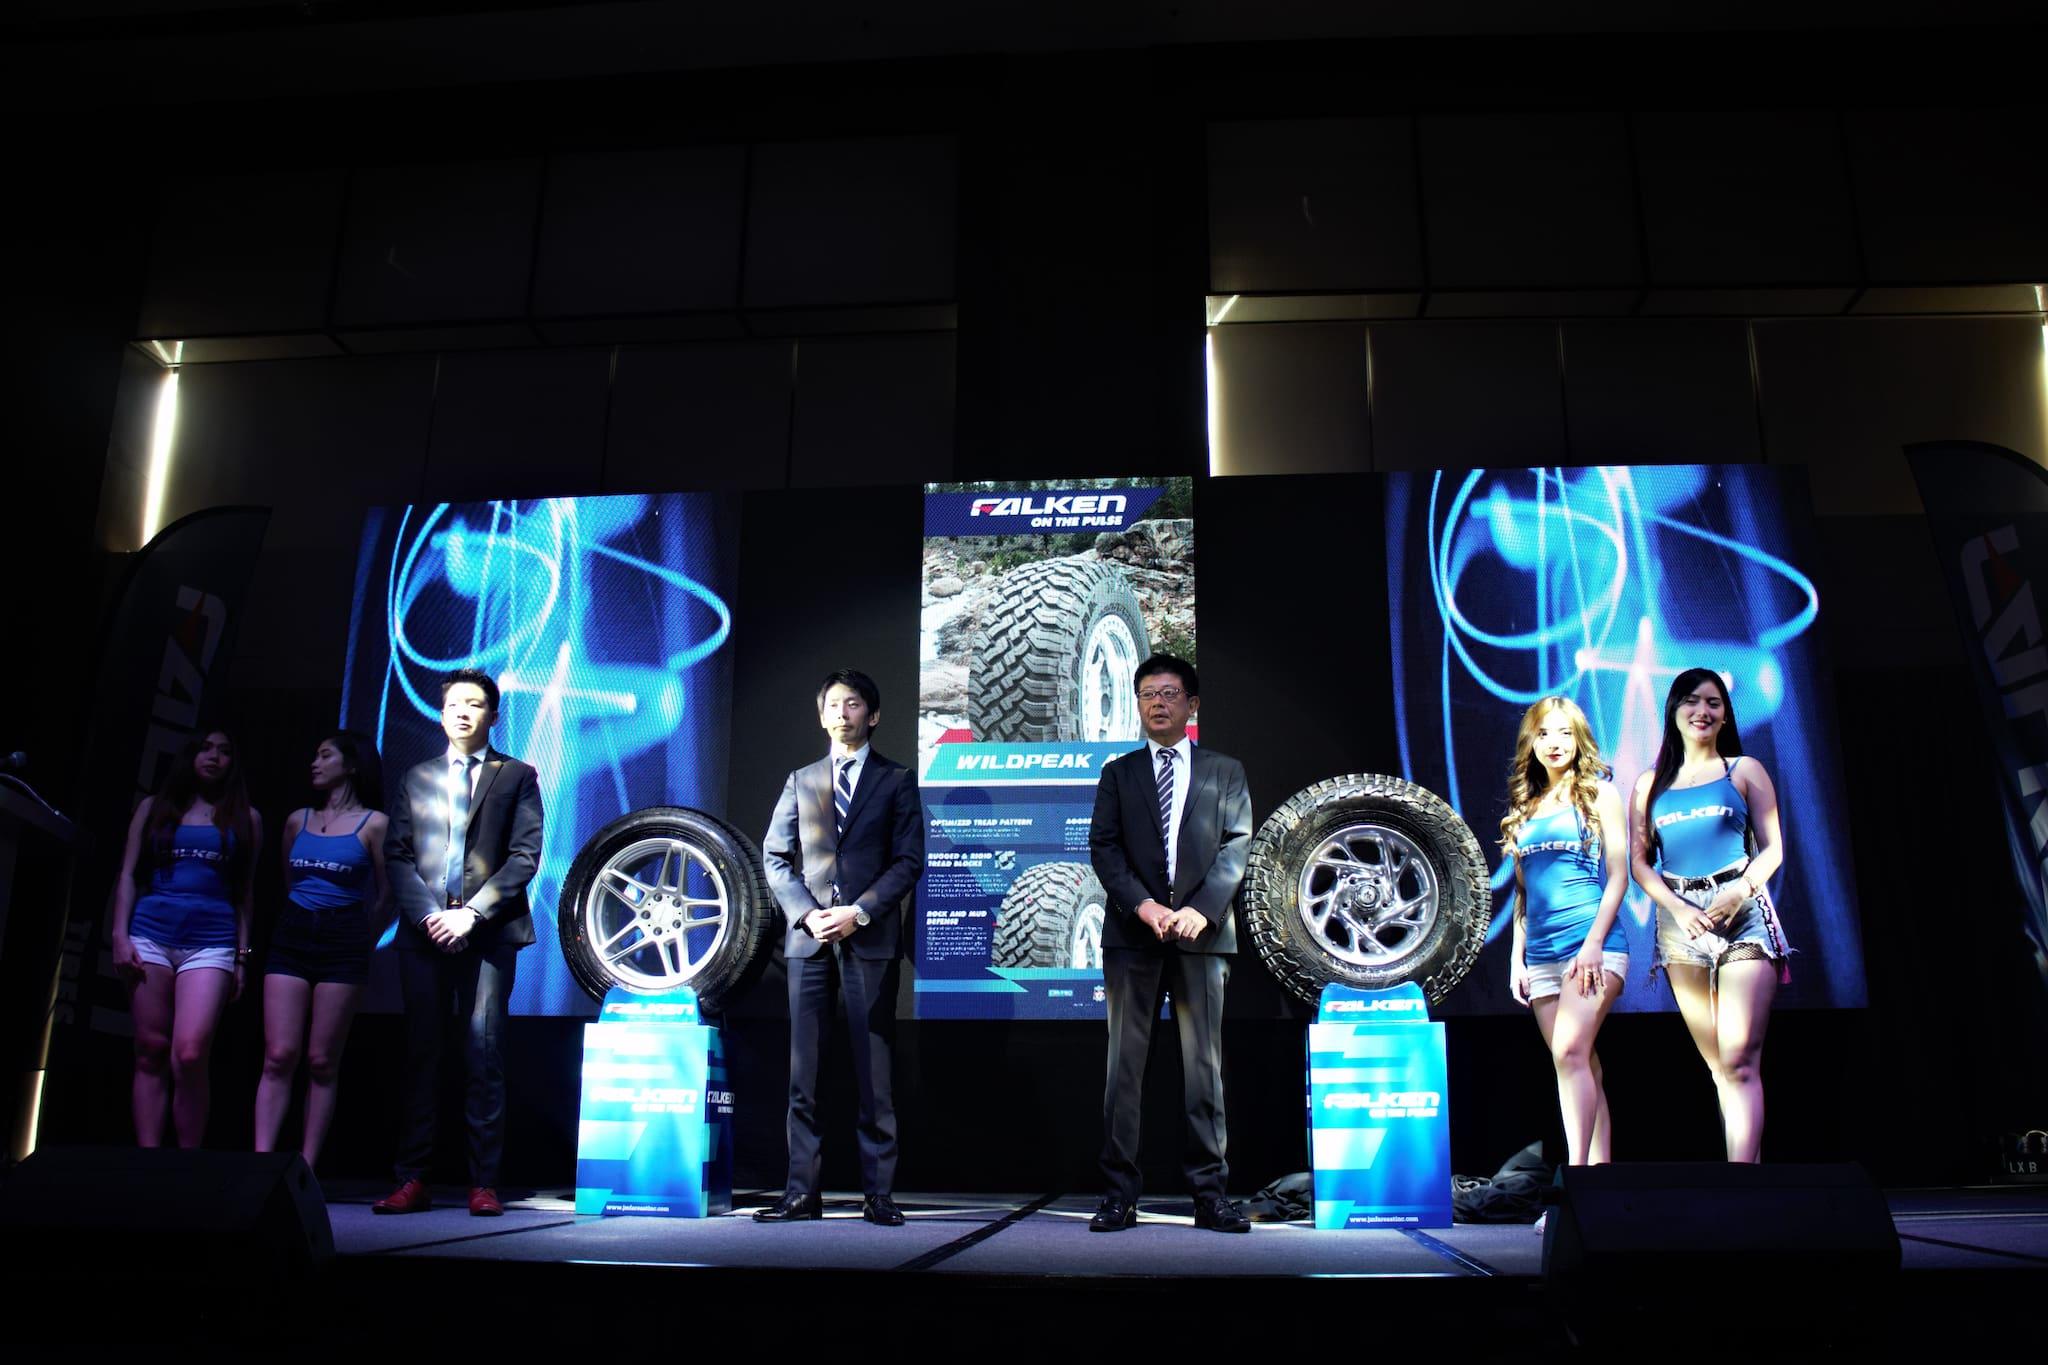 Falken PH Reveals Latest-Generation All-Terrain, Mud-Terrain Tires